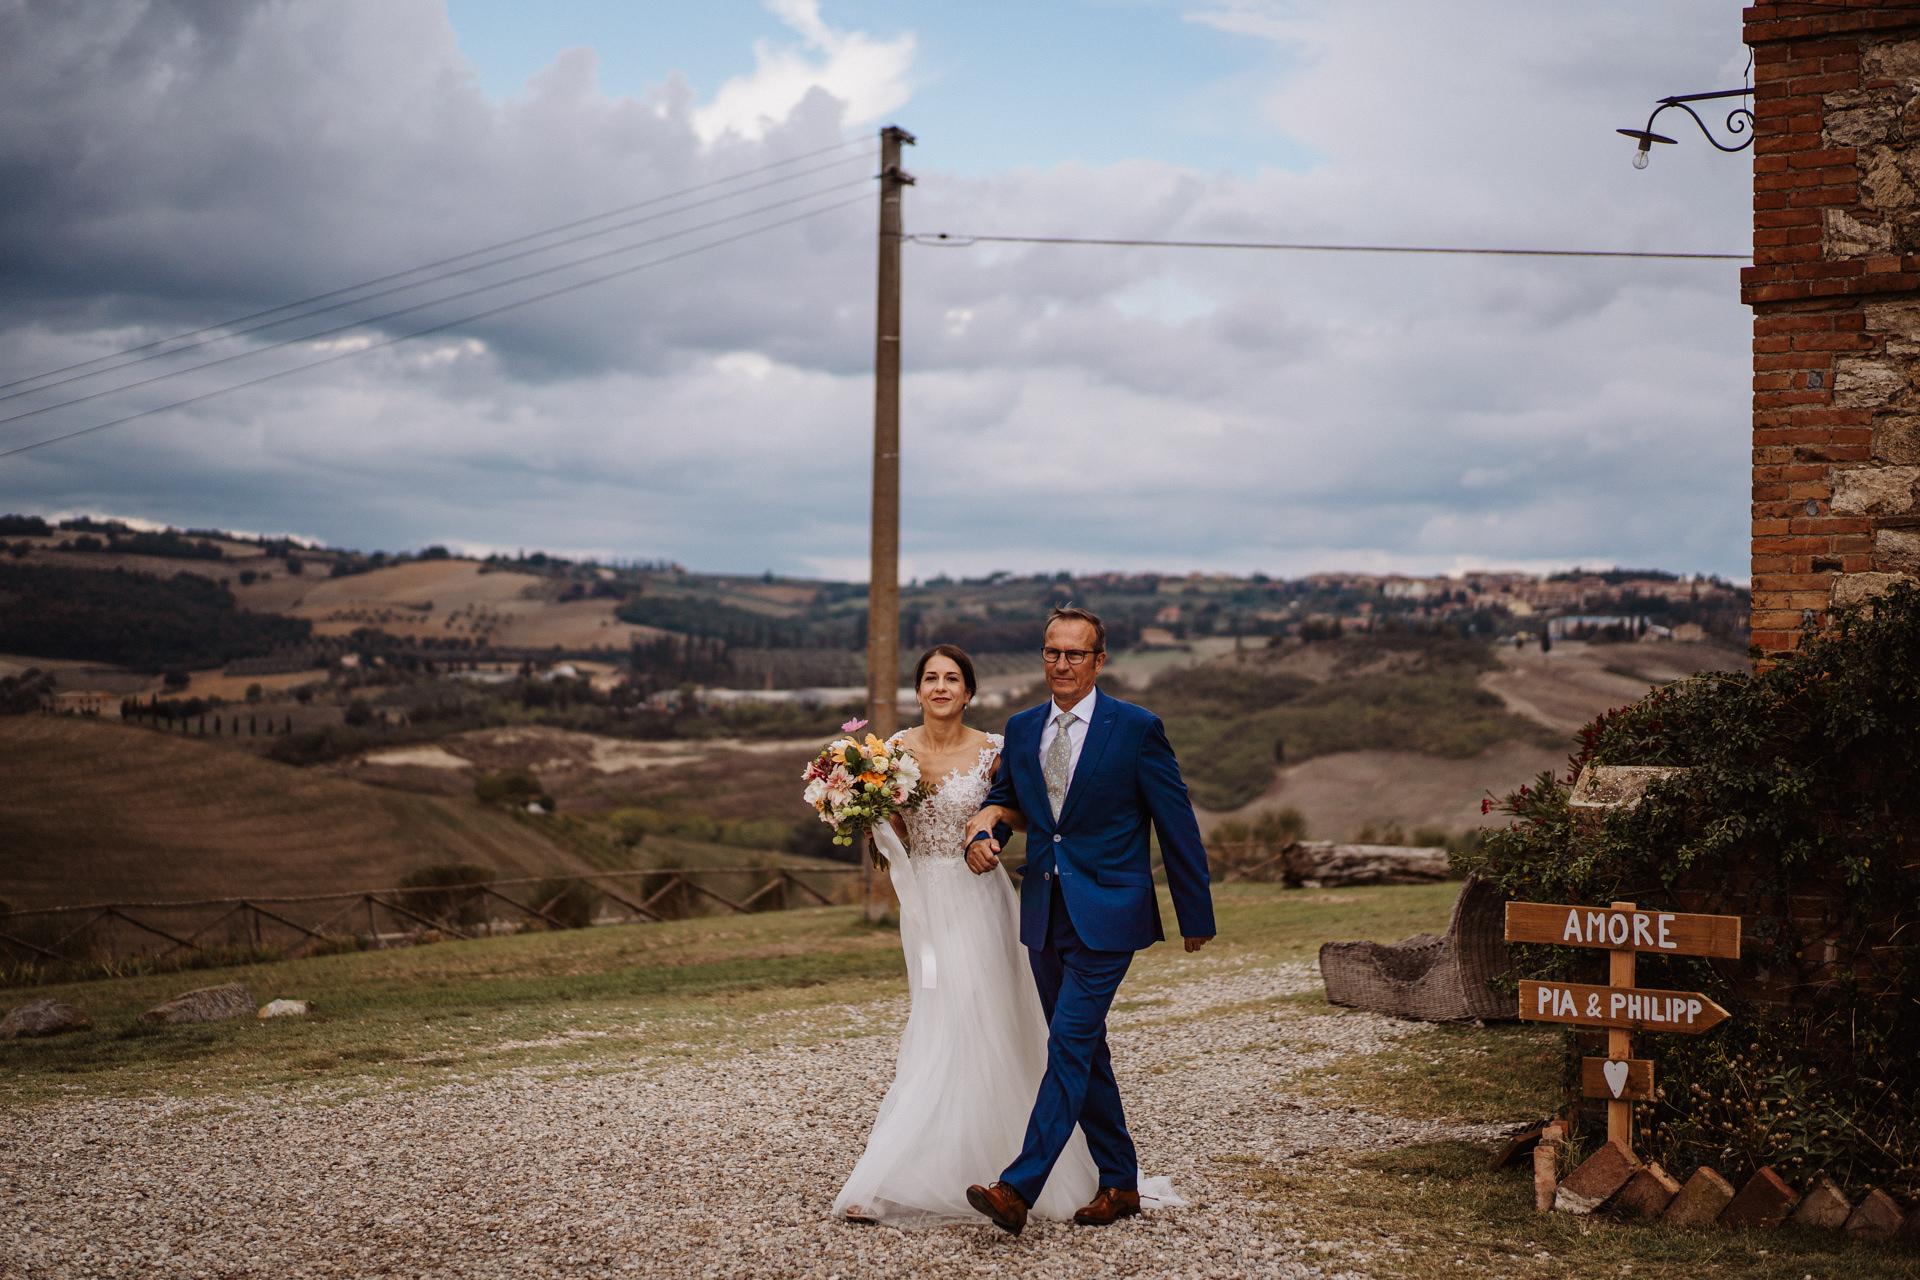 Il Rigo Elopement Picture of Agriturismo Il Rigo Bride   The bride is escorted by her father to the ceremony